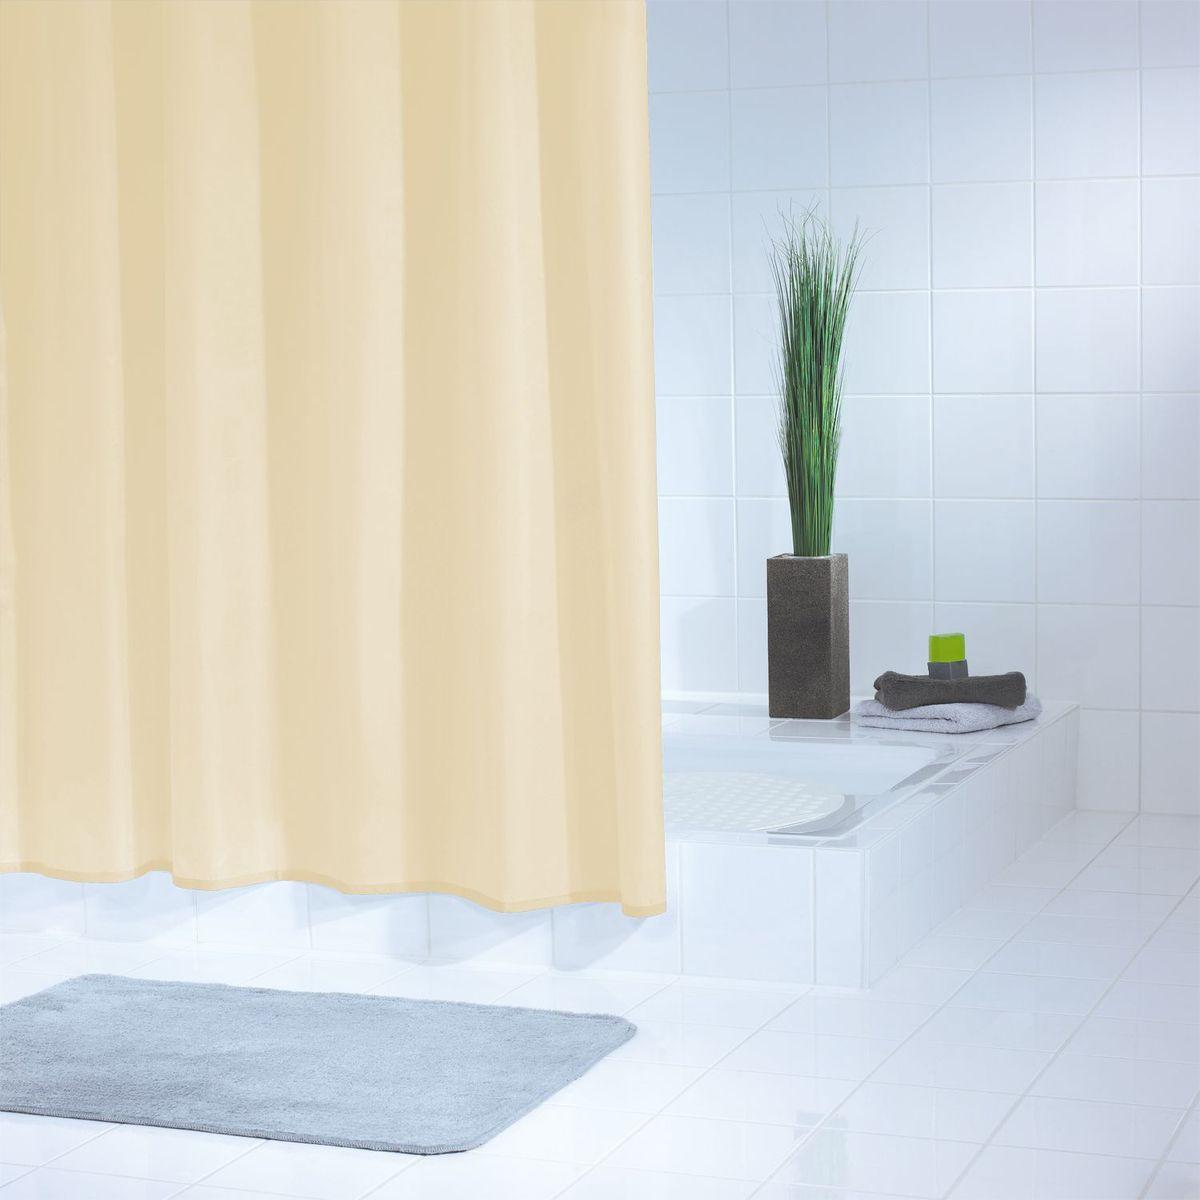 Штора для ванной комнаты Ridder Standard, цвет: бежевый, 240 х 180 см штора для ванной комнаты ridder helgoland цвет синий голубой 240 х 180 см